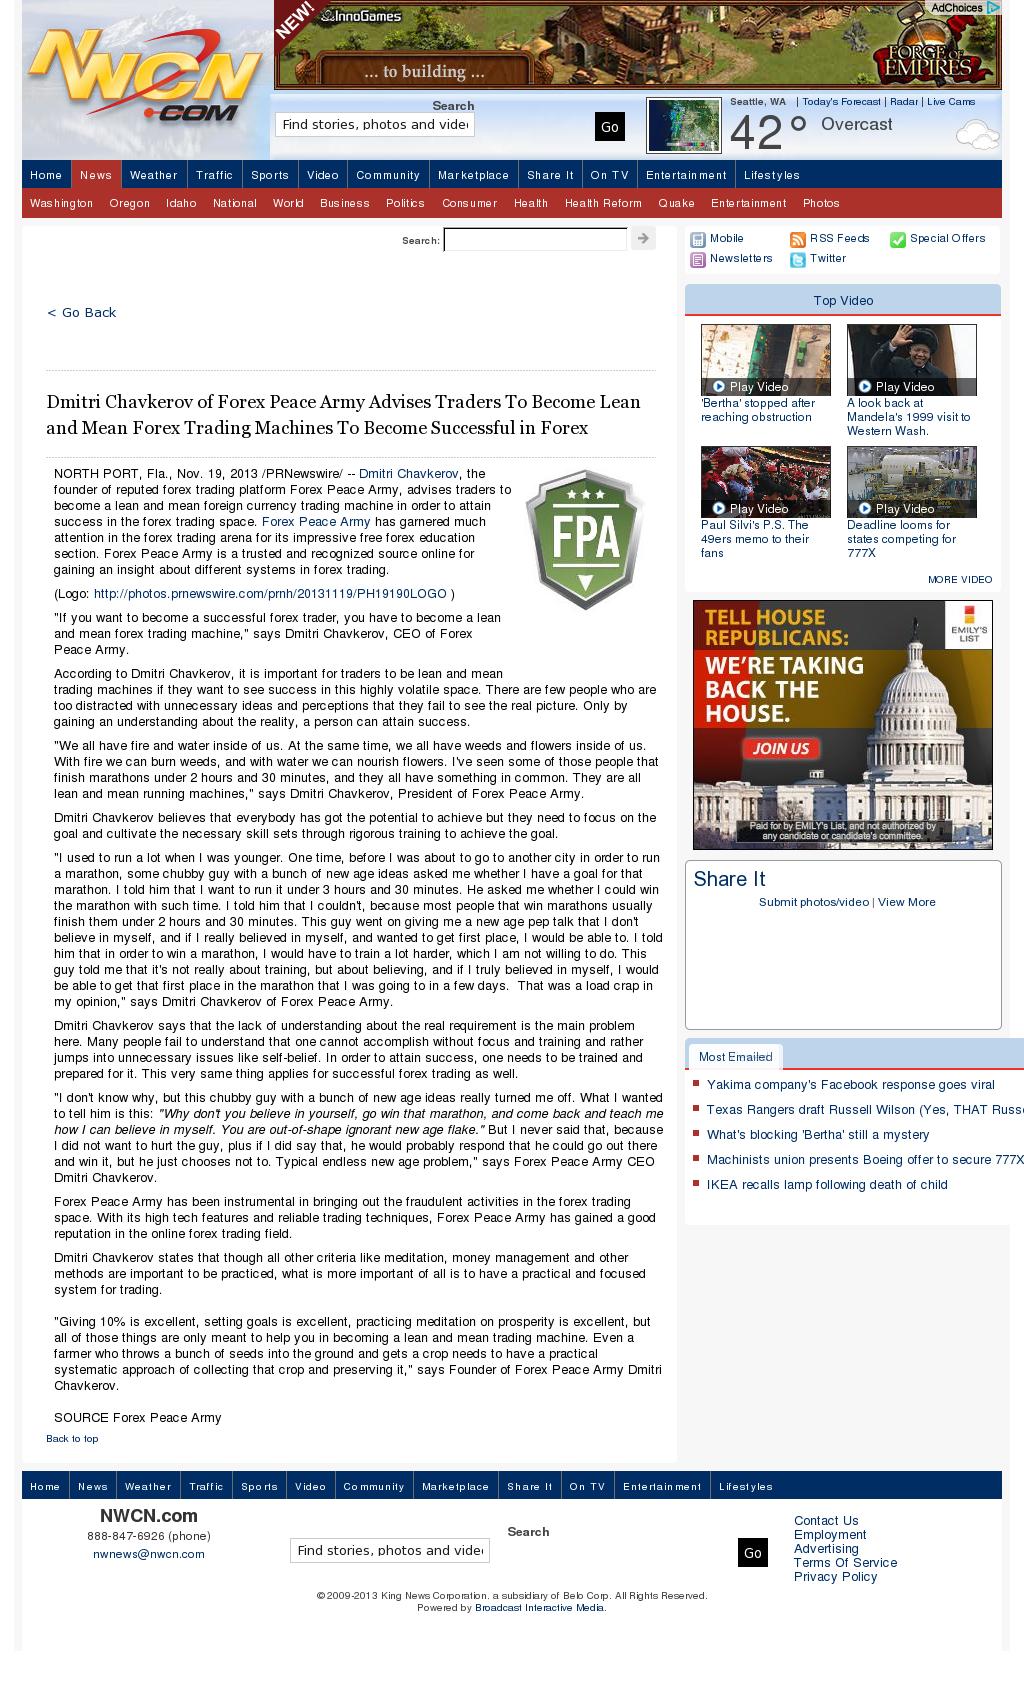 Dmitri Chavkerov - NorthWest Cable News (Seattle, WA) - Lean Forex Trading